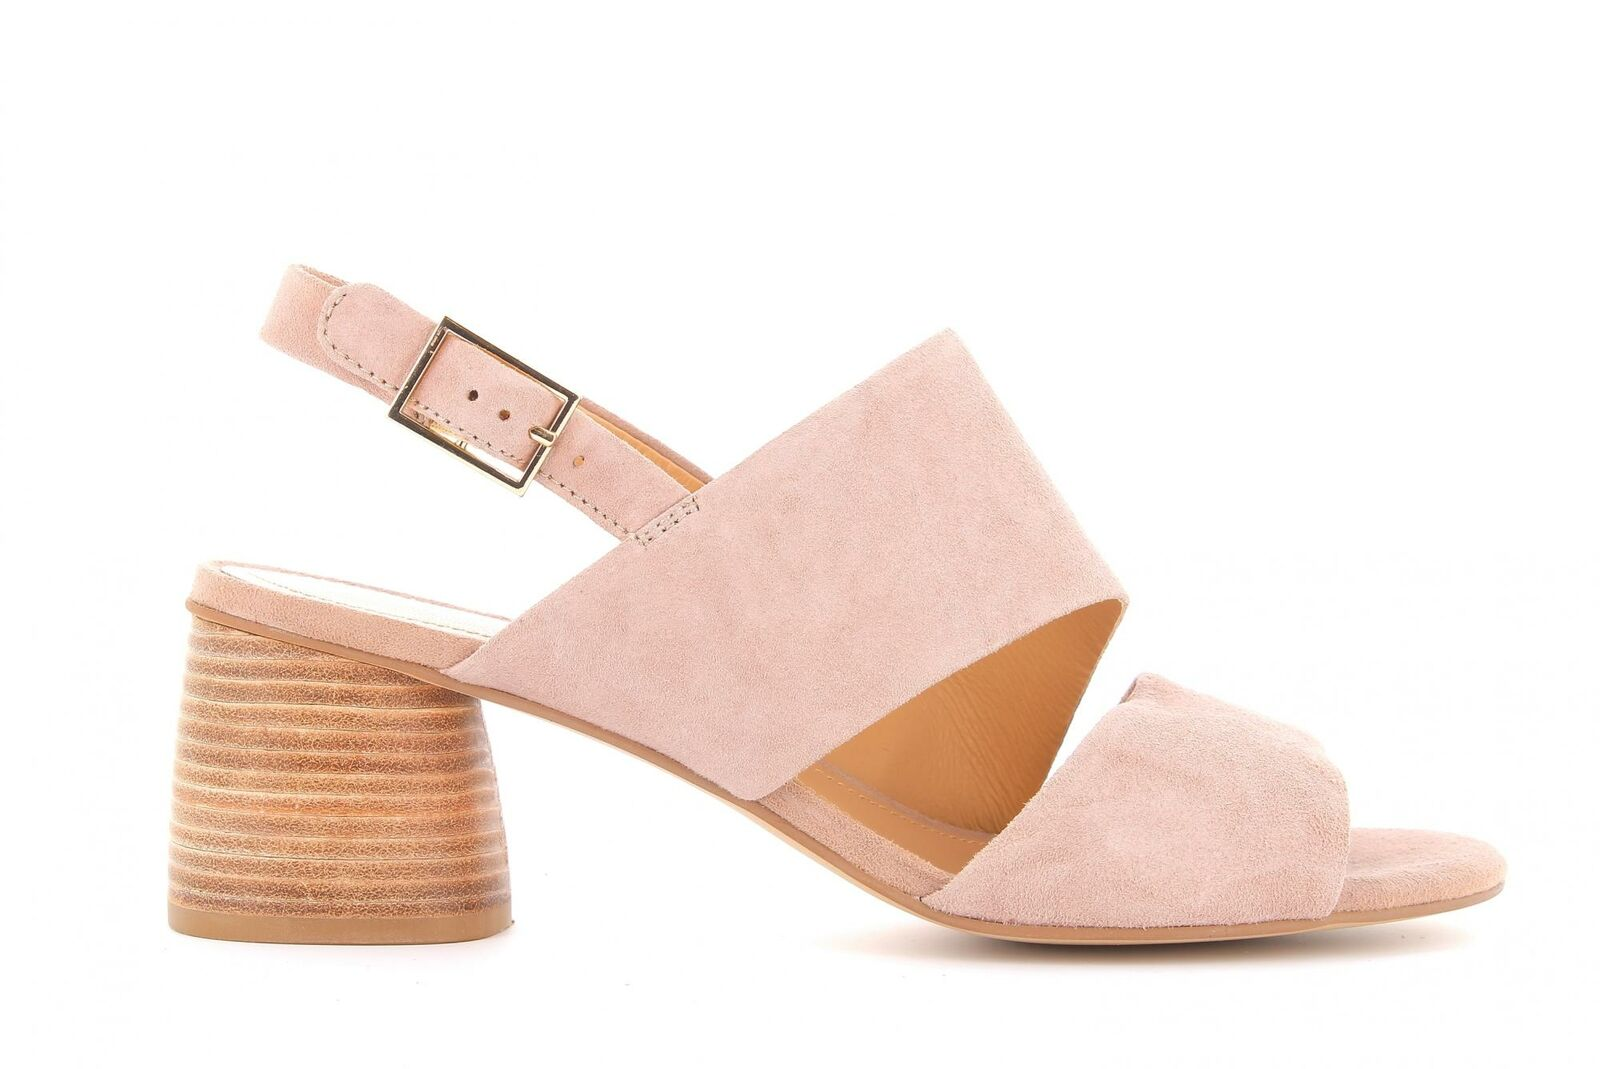 Adele Dezotti P19f zapatos femme sandales AV0902X NUDE